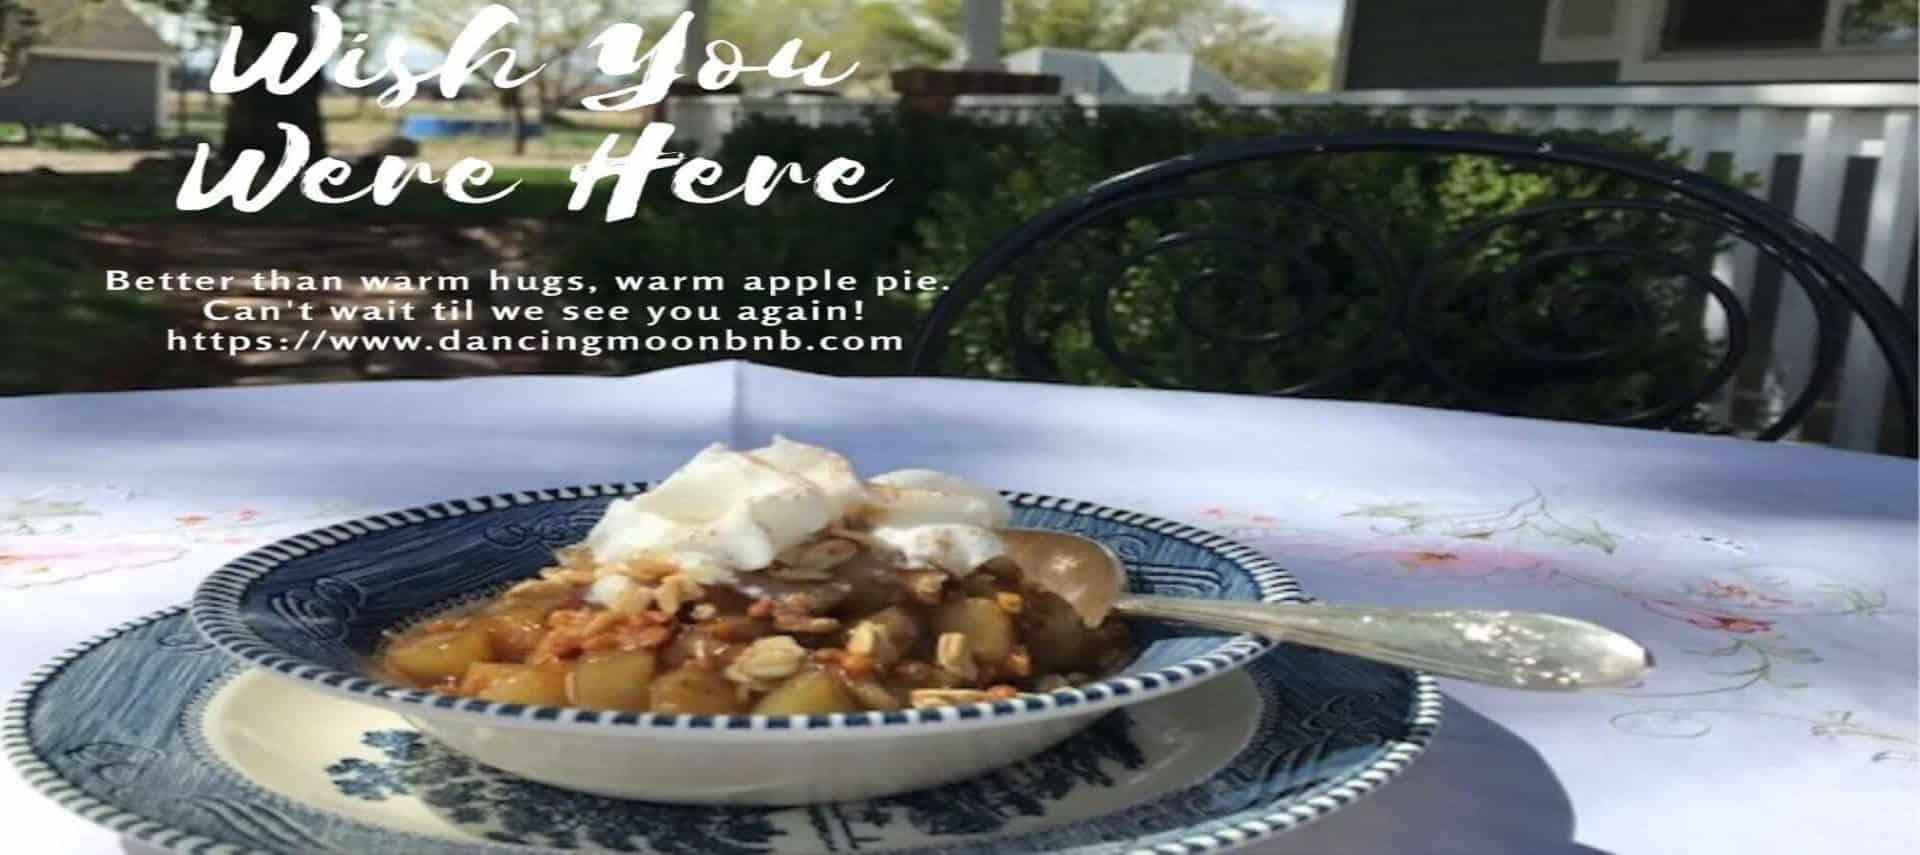 Pic of apple pie dessert